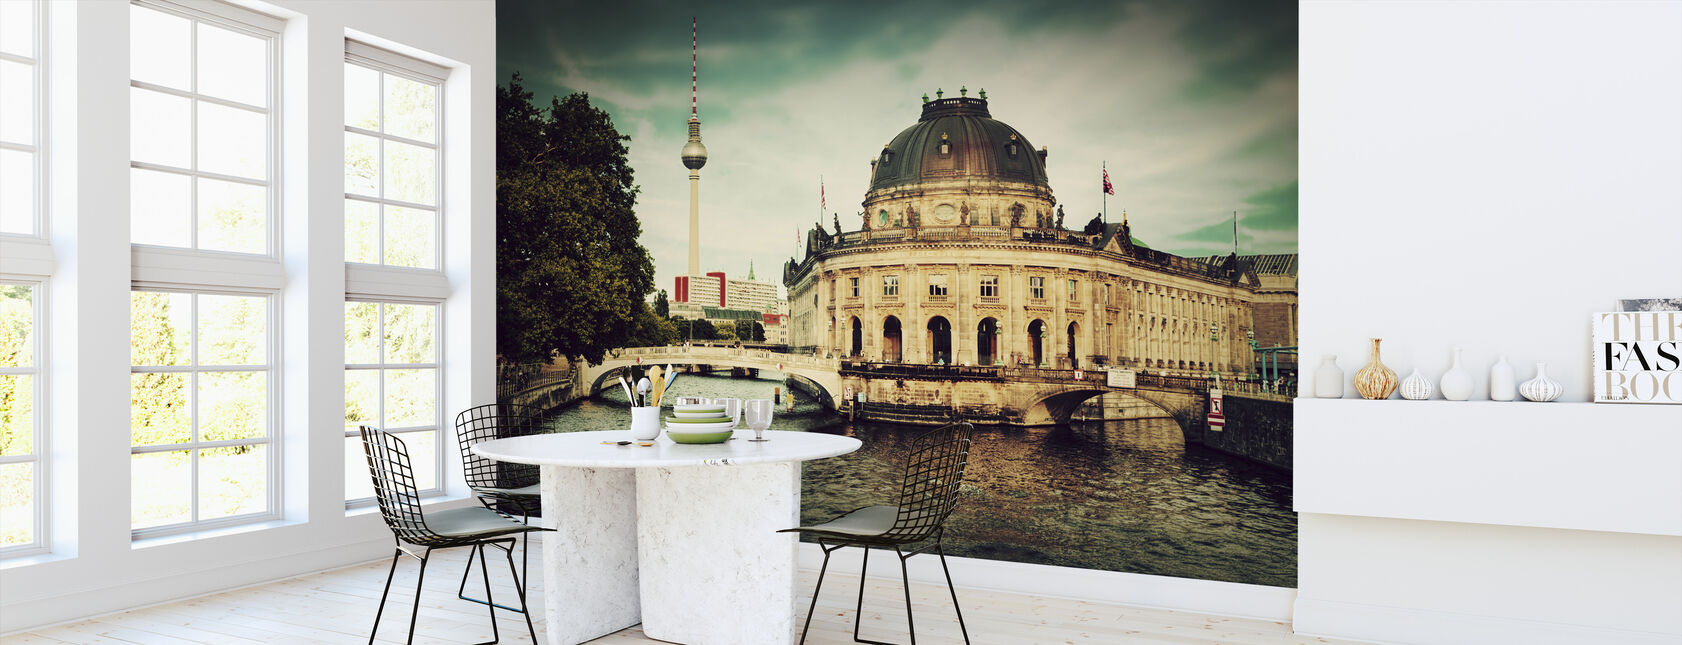 The Bode Museum in Berlin - Wallpaper - Kitchen